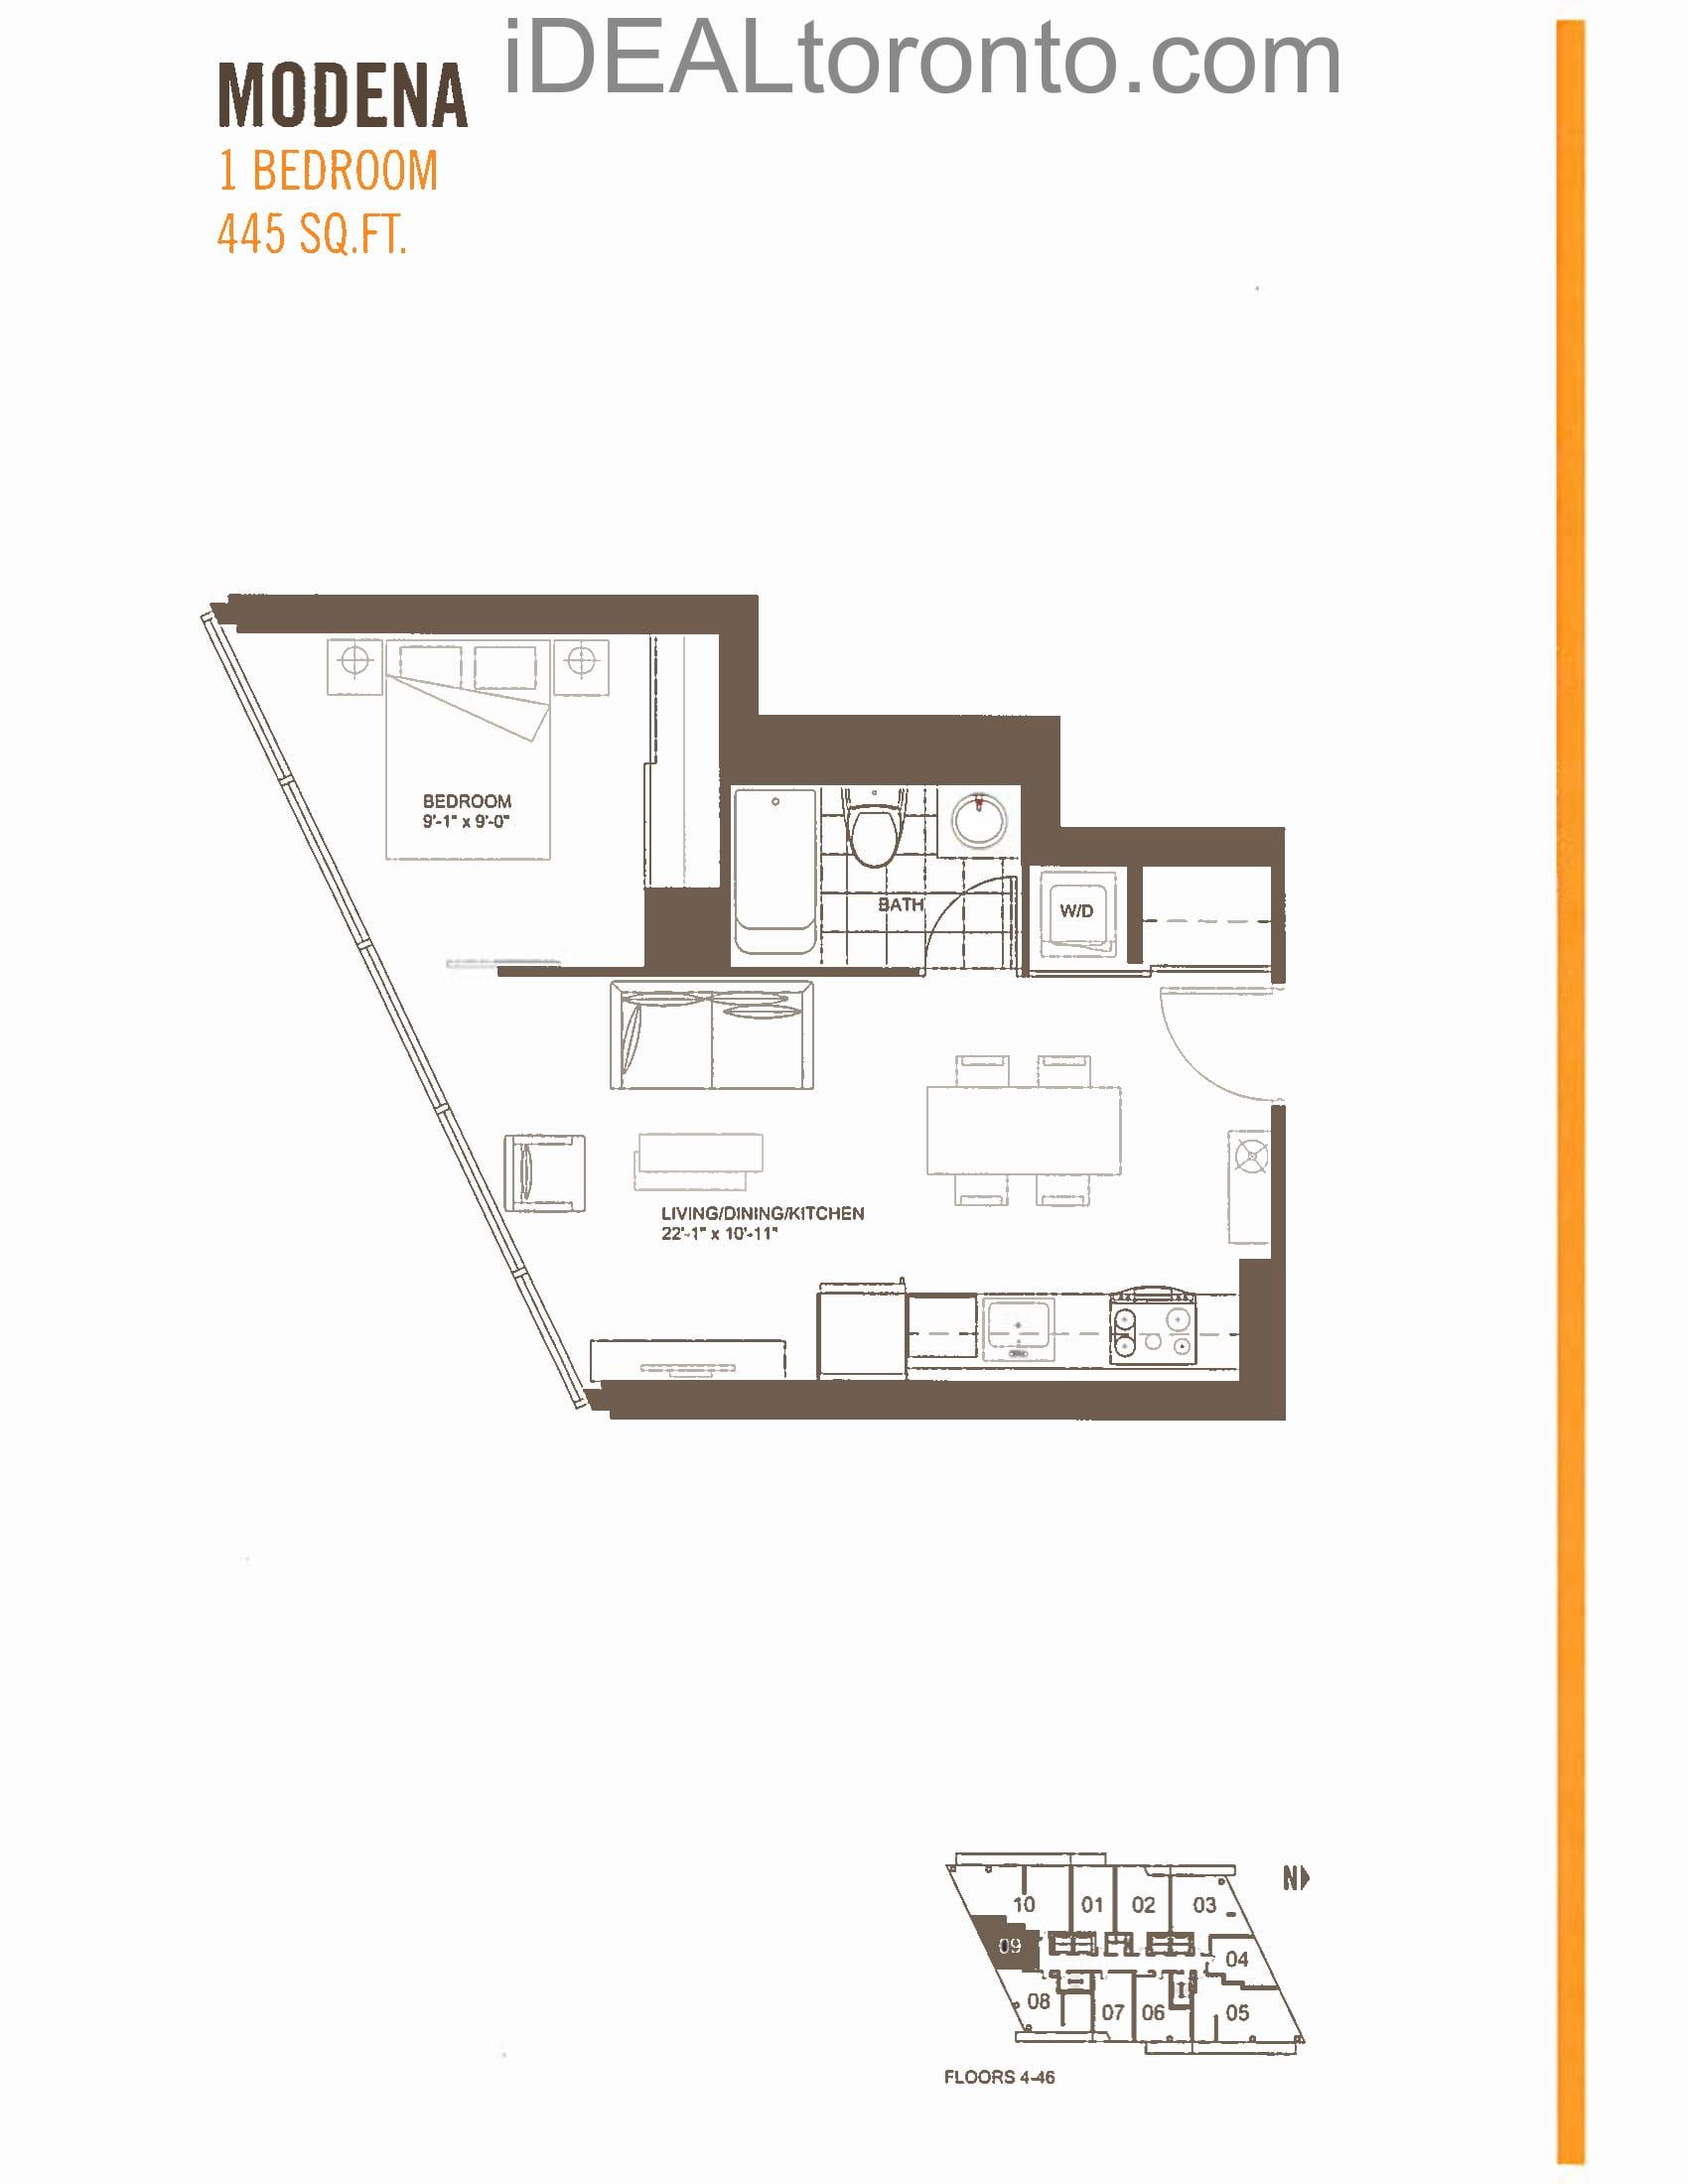 Modena: 1 Bedroom, S, 445 SqFt